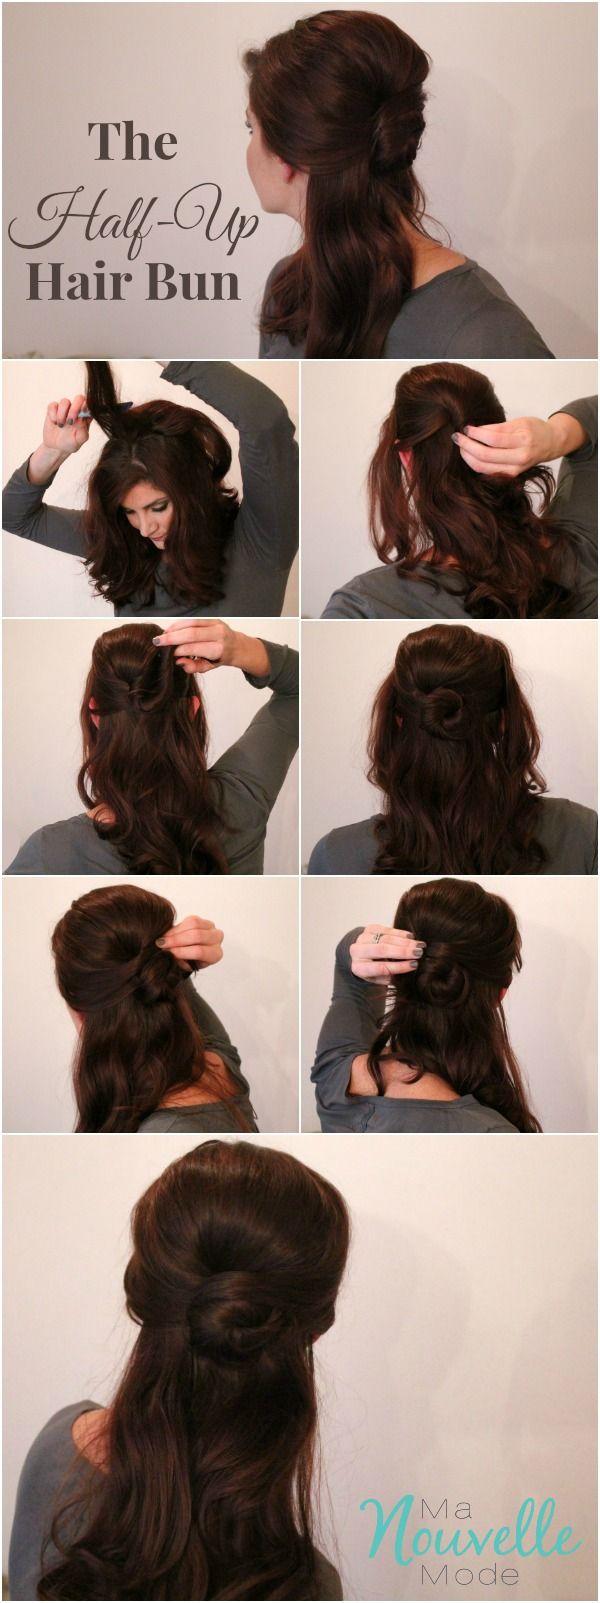 Easy Half Up hair bun step-by-step tutorial                                                                                                                                                                                 More